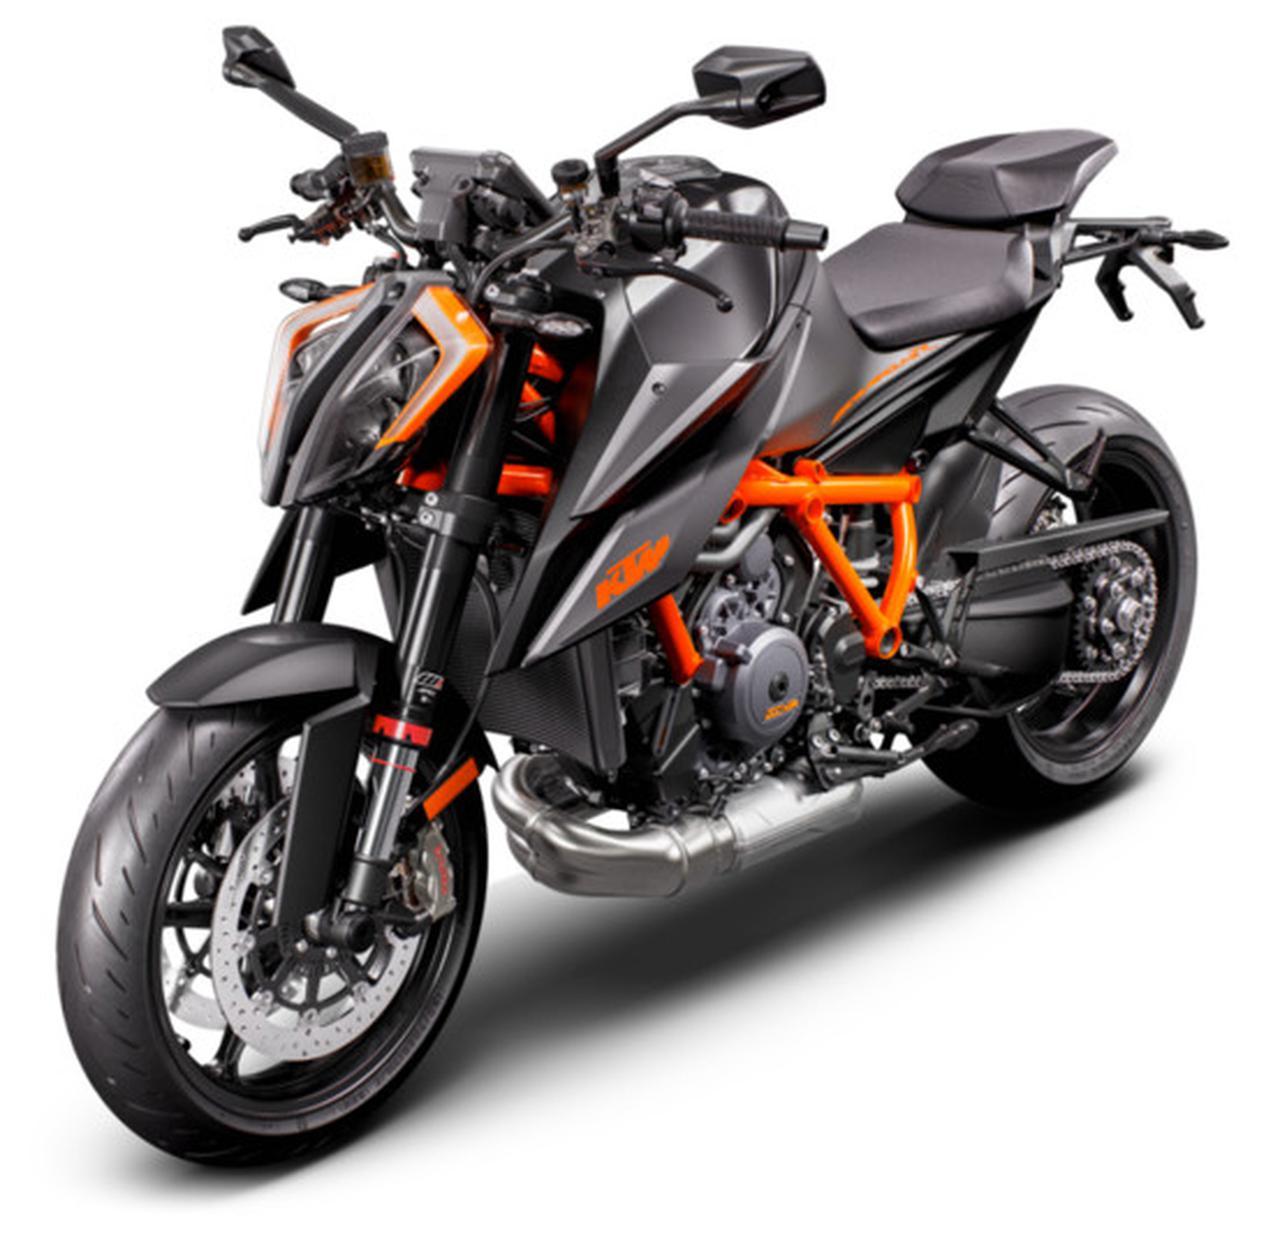 Images : 3番目の画像 - KTM「1290 SUPER DUKE R」の写真を全て見る! - webオートバイ